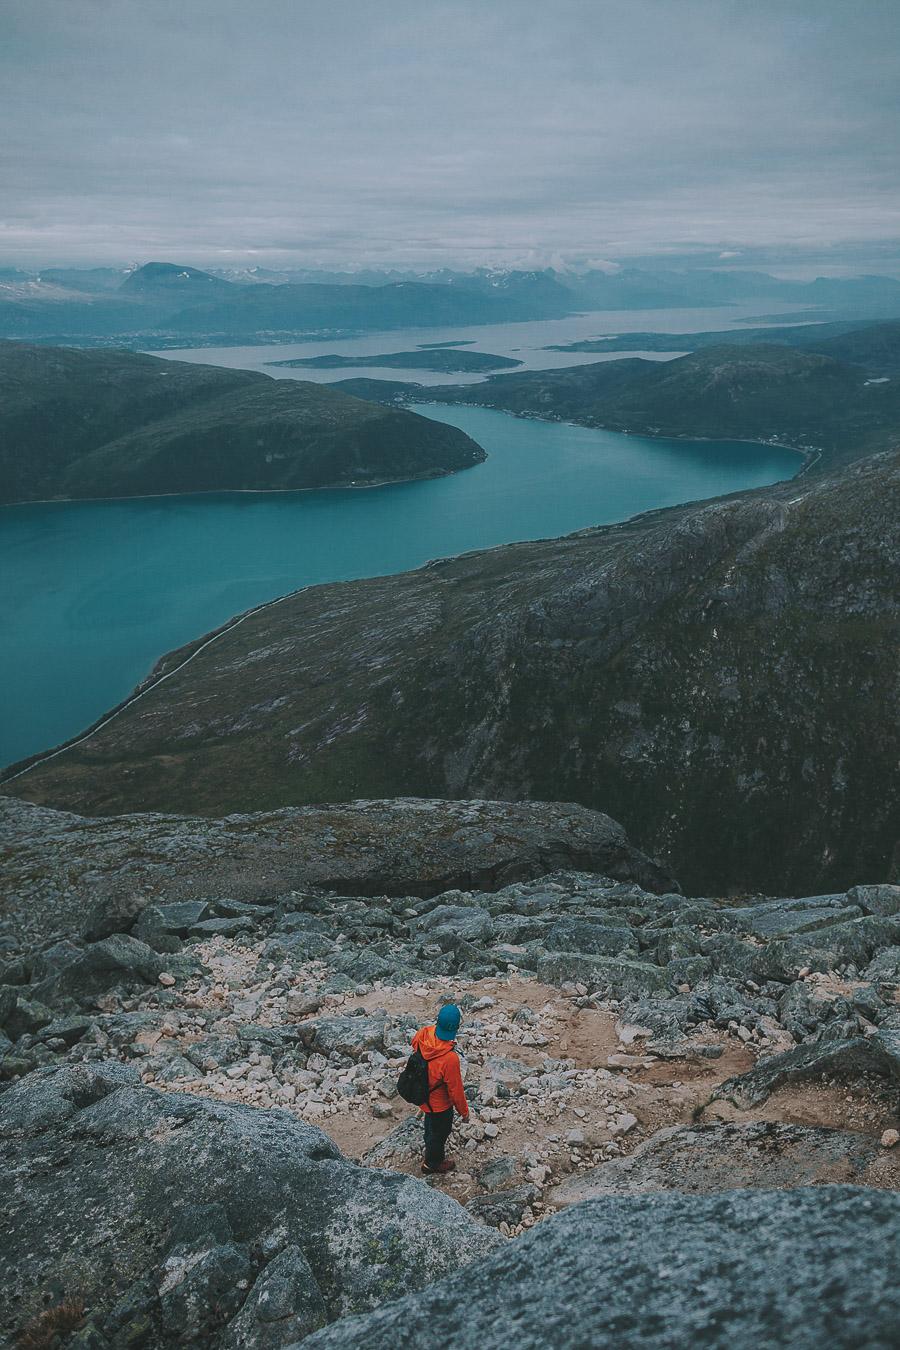 Man in orange jacket hiking to Store blåmann